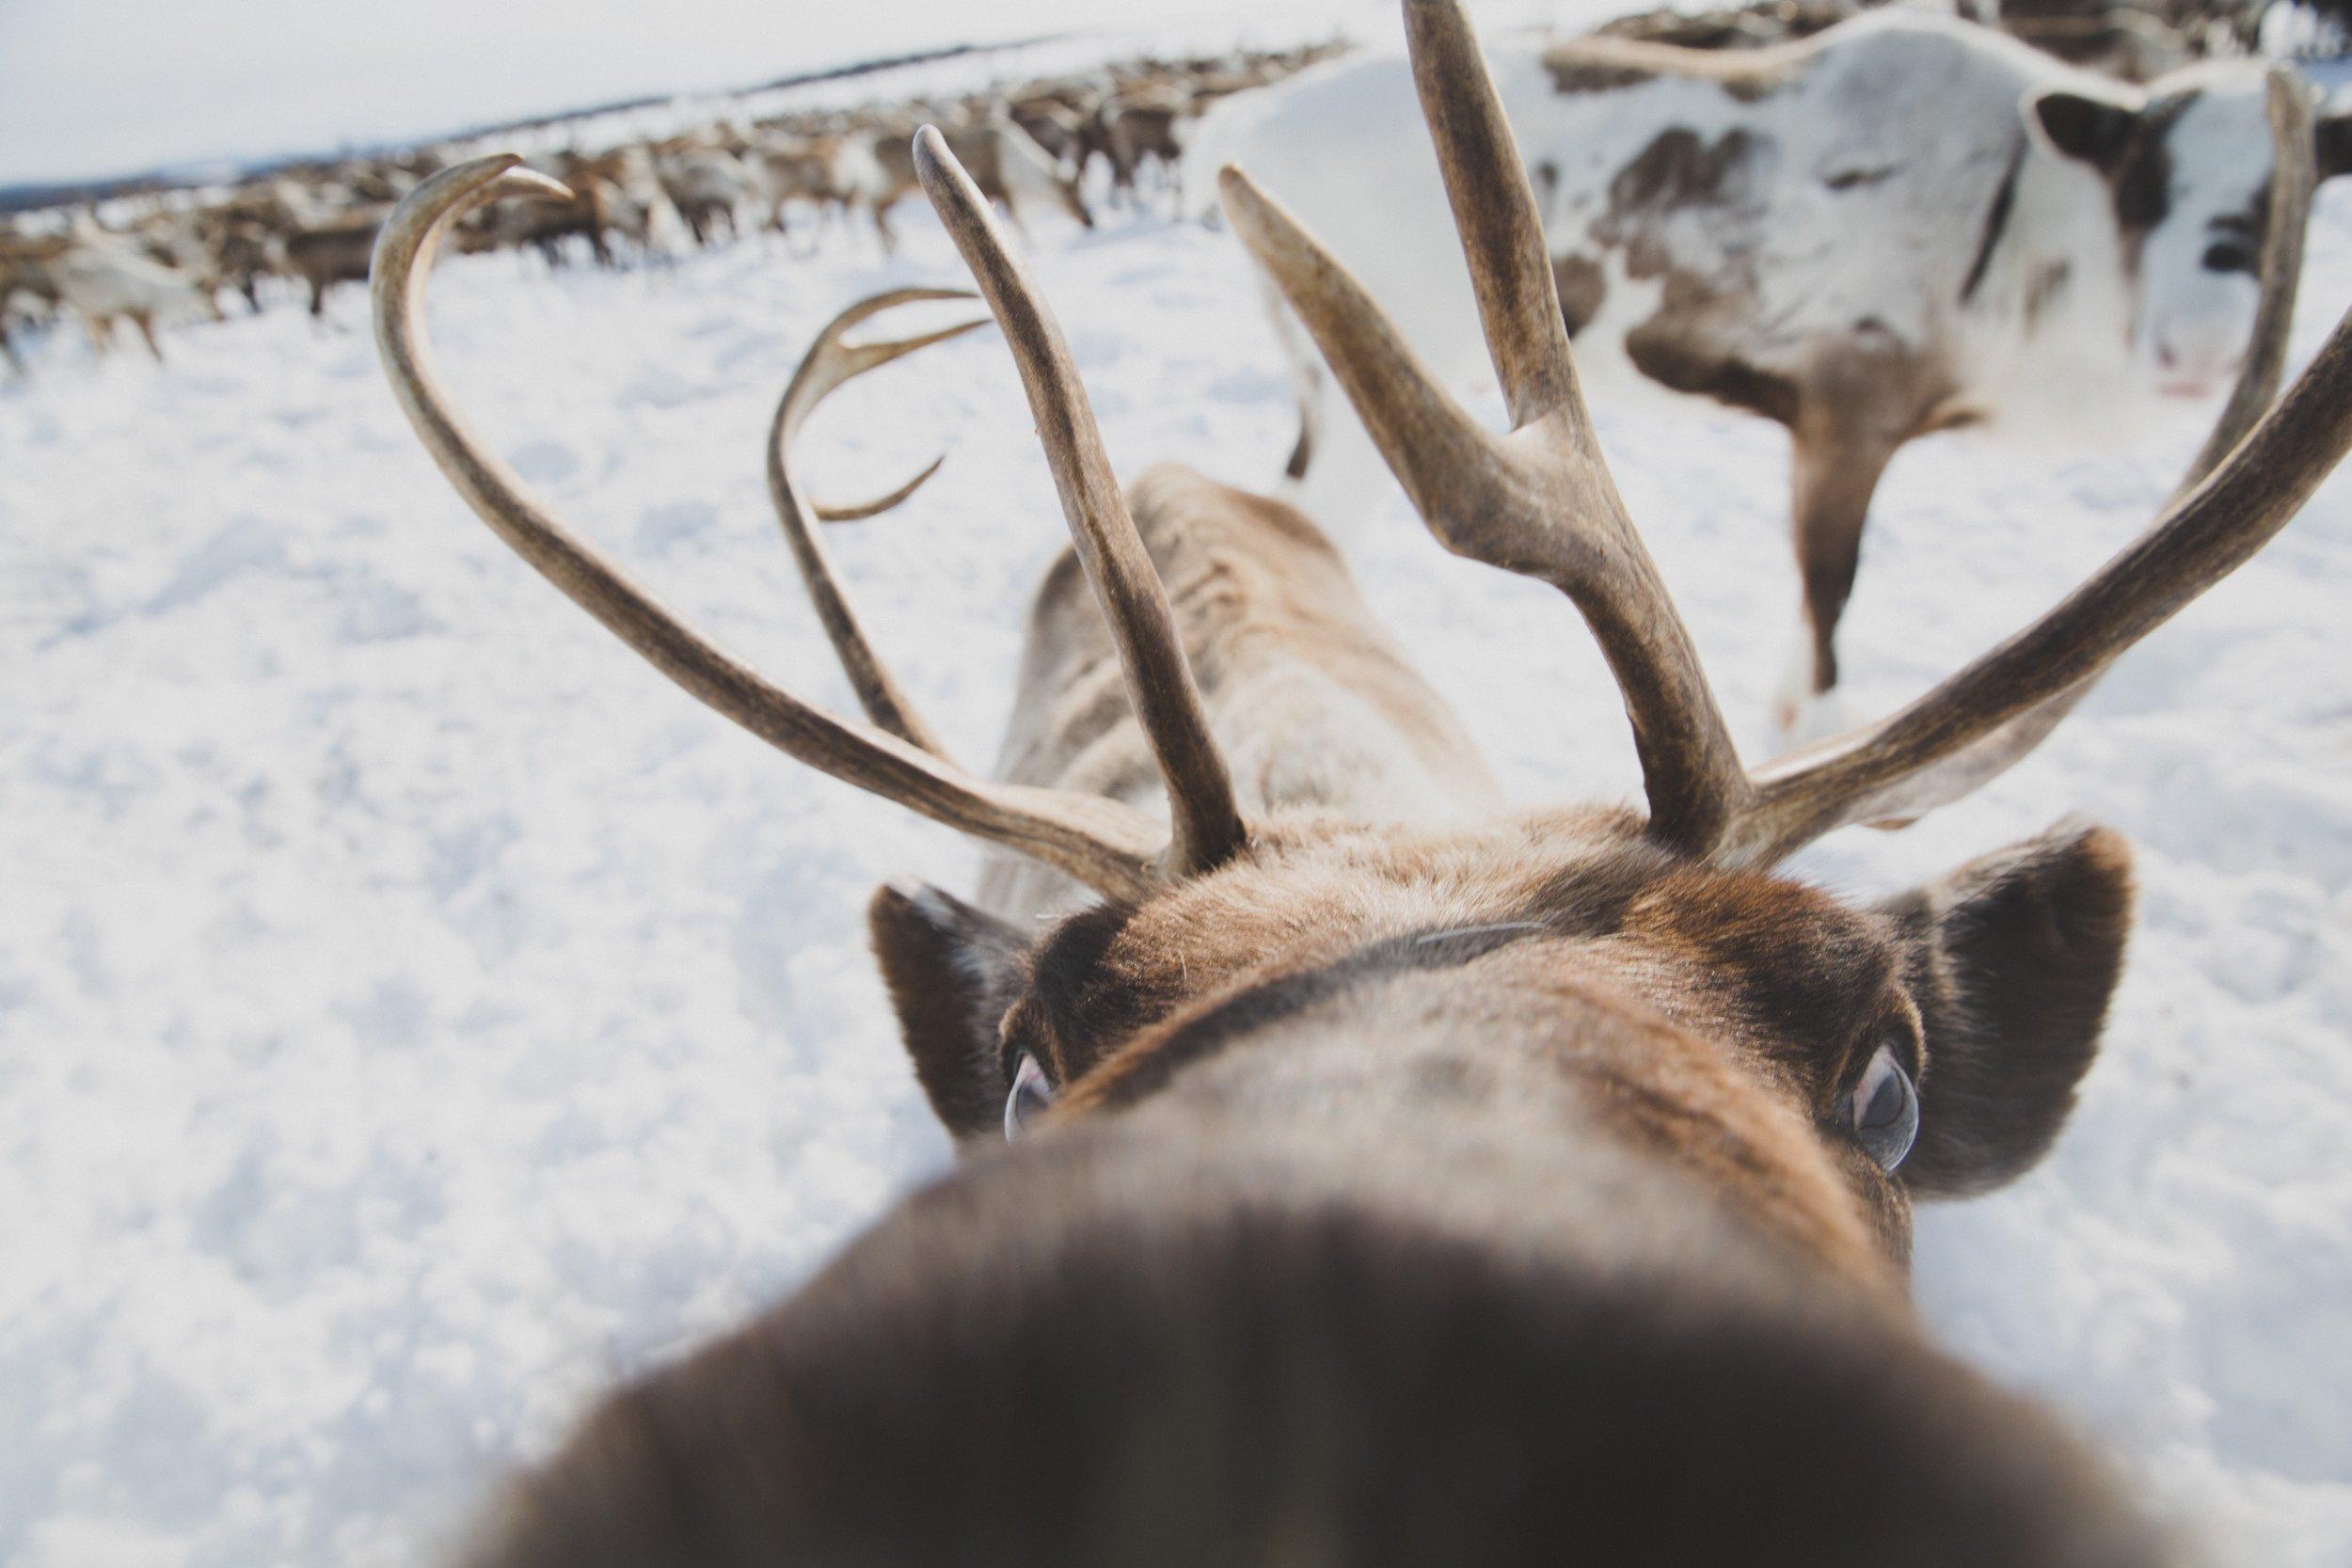 reindeer-kamchatka-travel-russia-trip-inertia.jpg